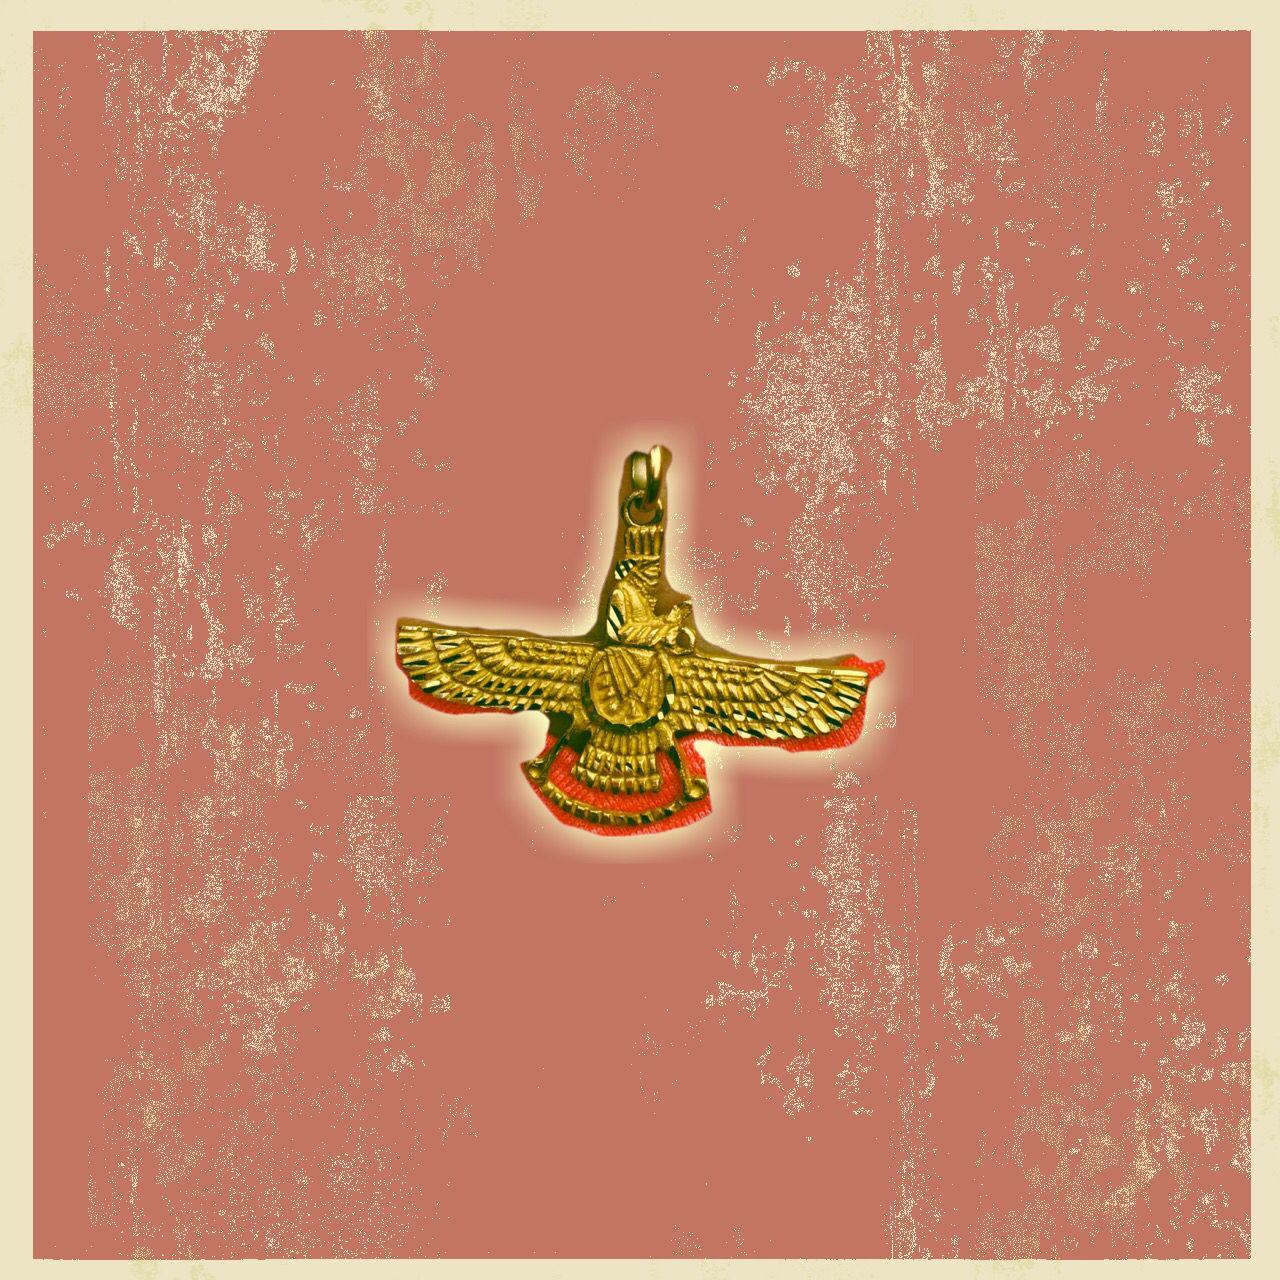 The Zoroastrian symbol - an antique religion in Persia